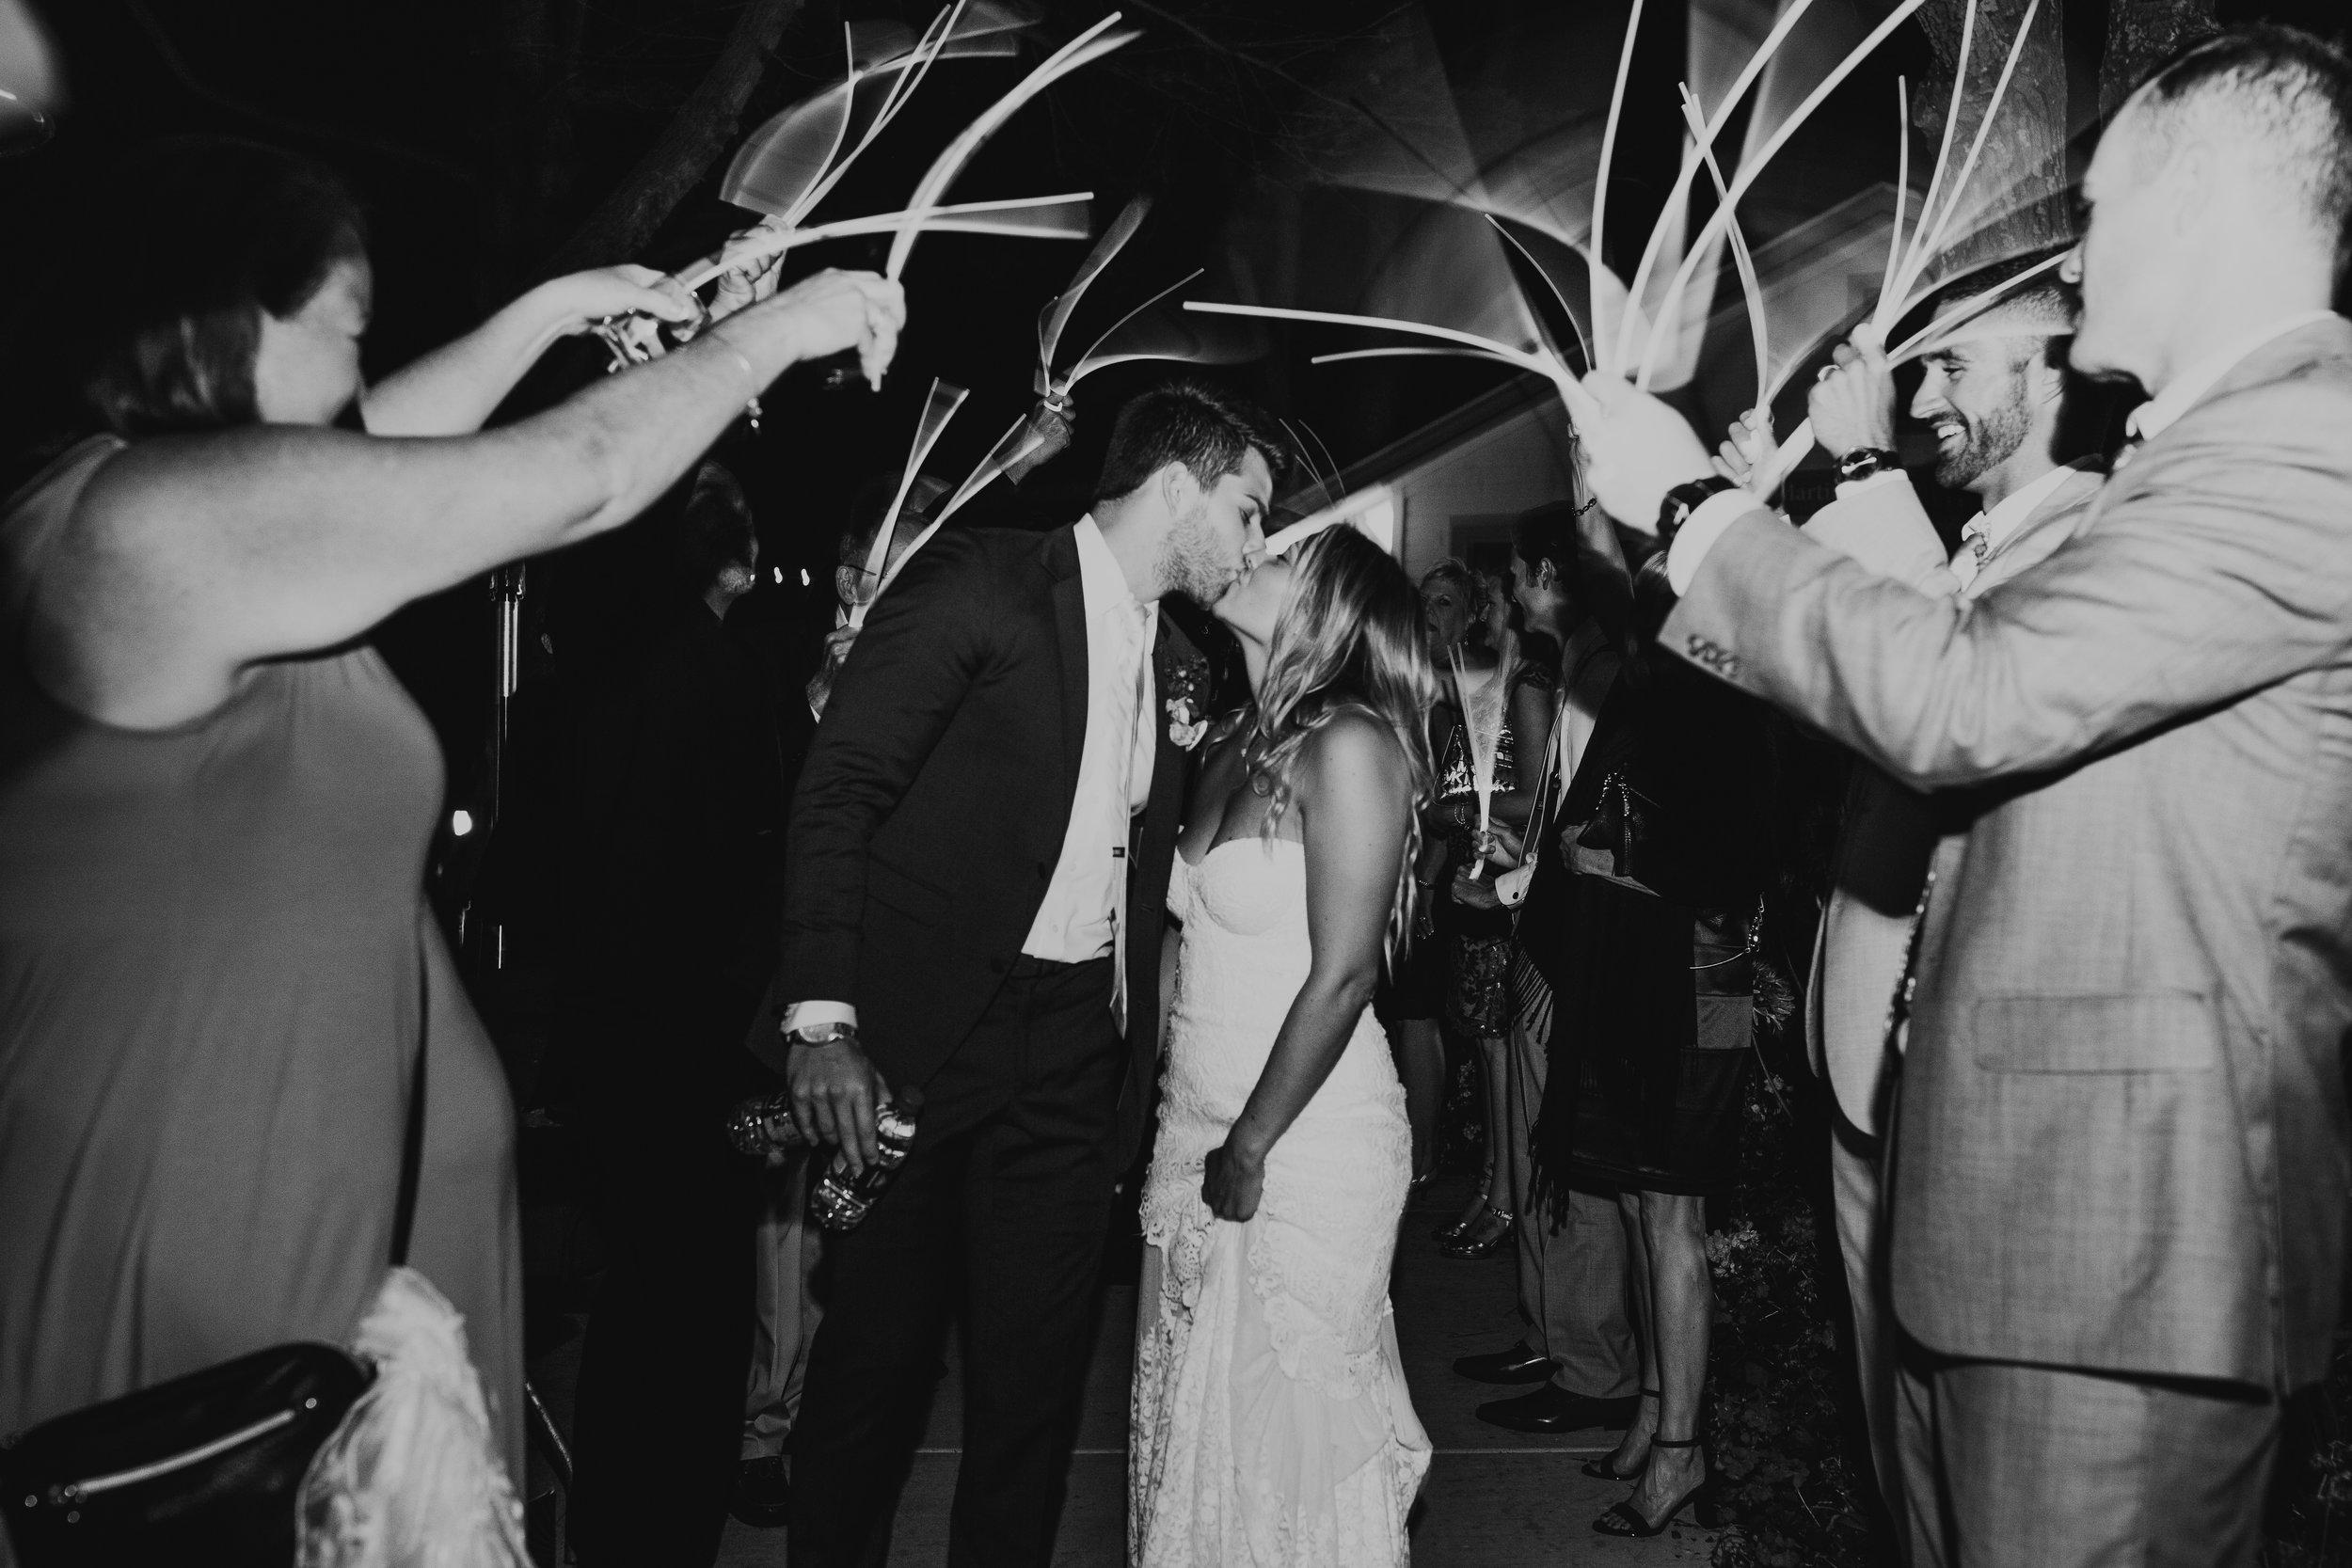 martin-johnson-house-wedding-san-diego7991-2.jpg